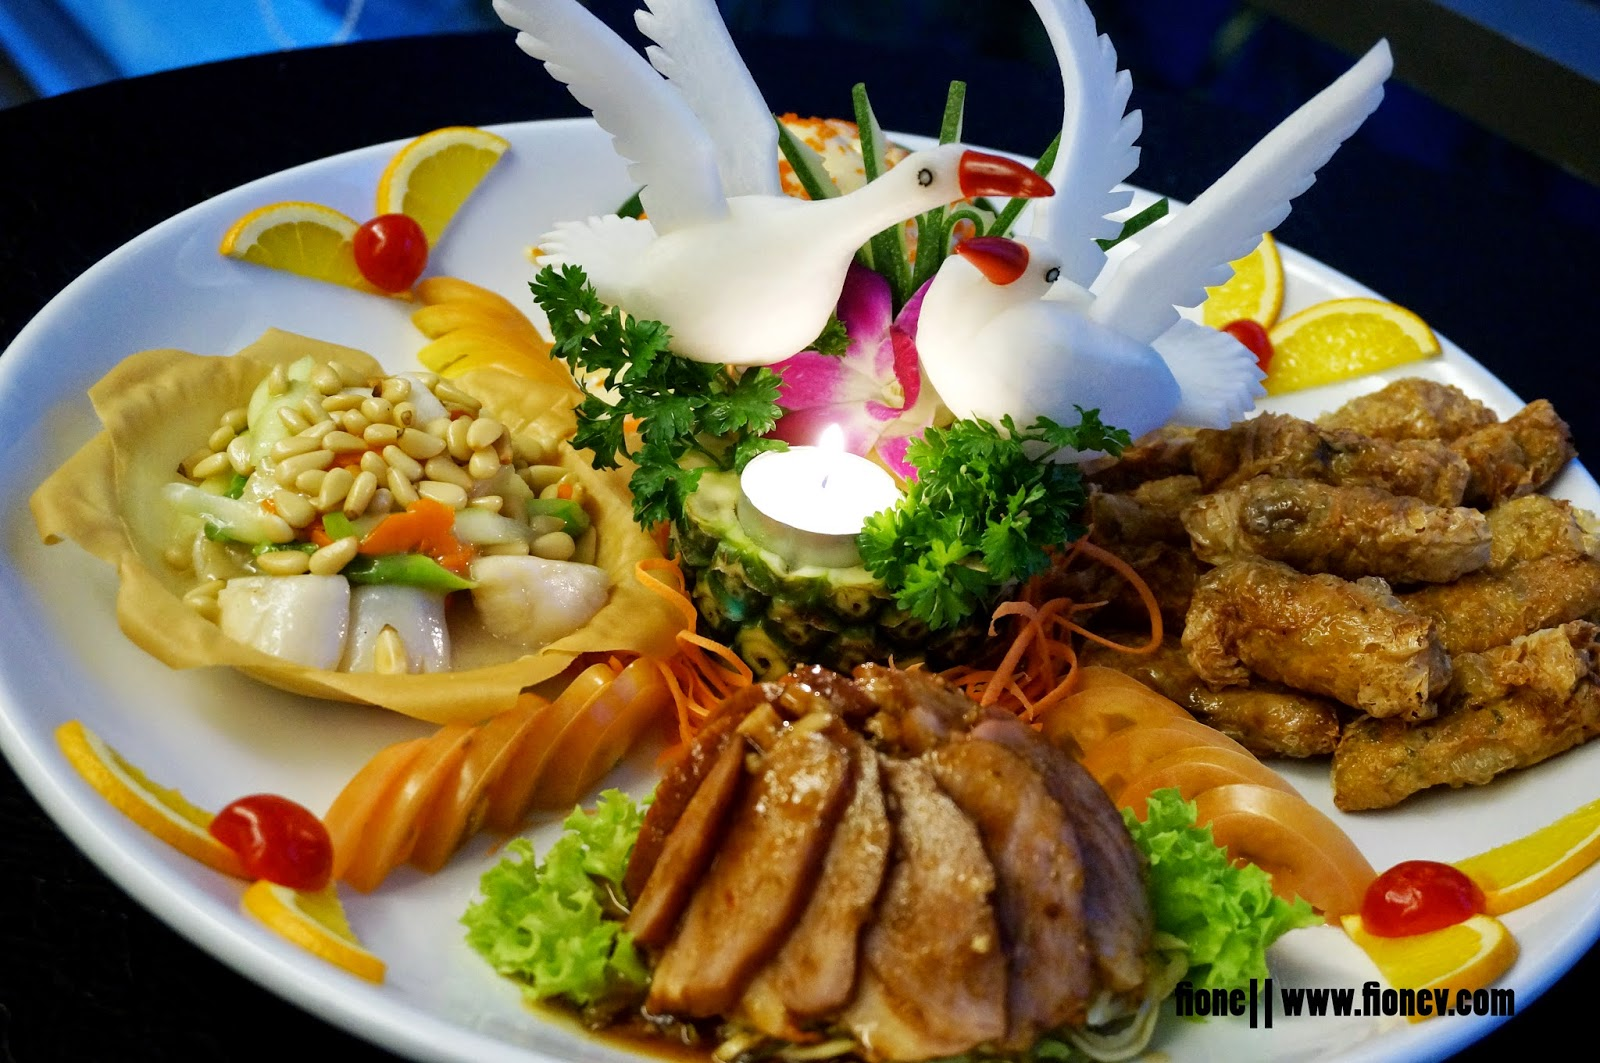 DSC04927 %E5%89%AF%E6%9C%AC2 - Asian Wedding Food